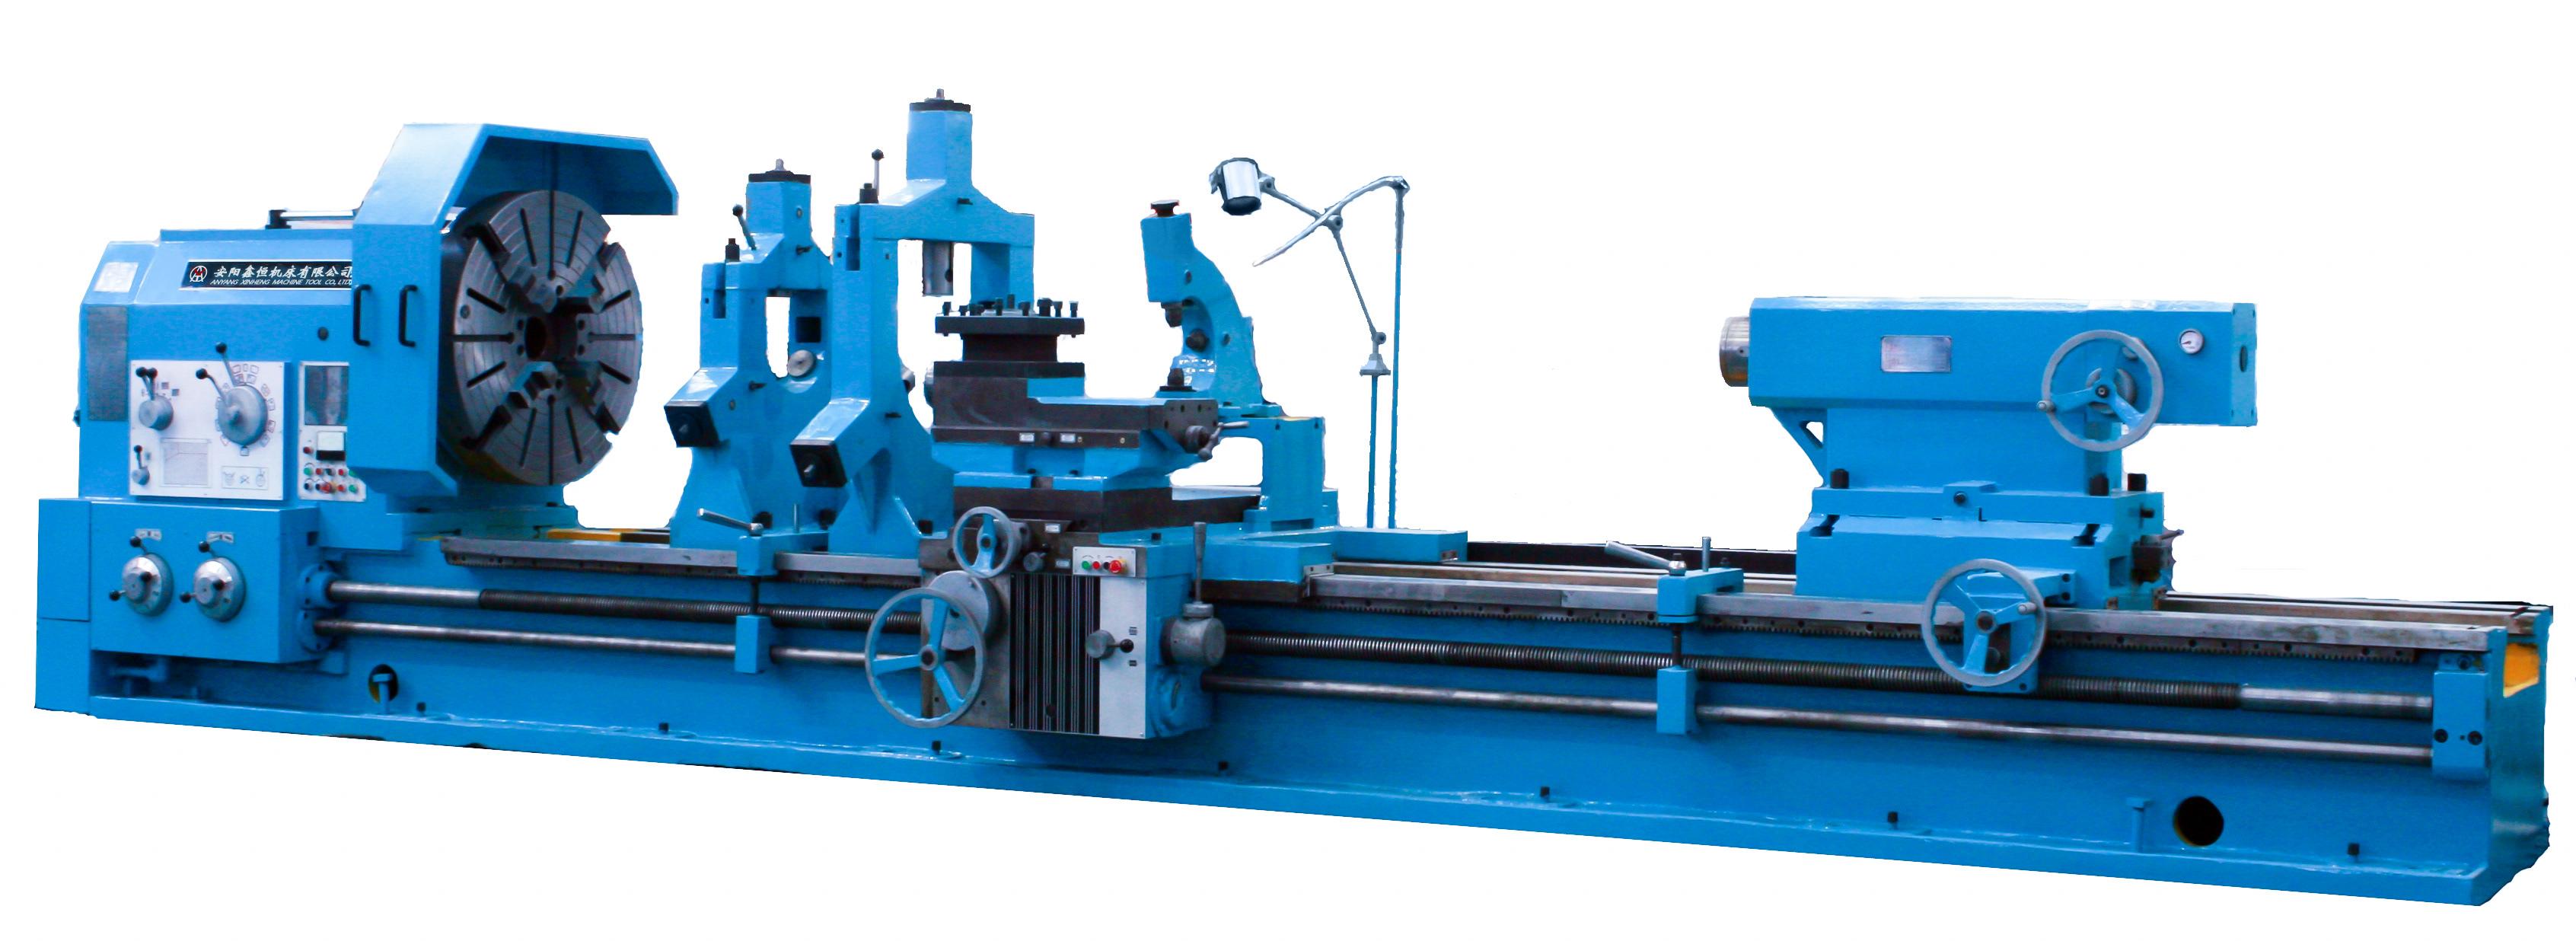 Heavy Duty Torno Machine Metal precision heavy duty lathe with max.weight of workpiece 32t